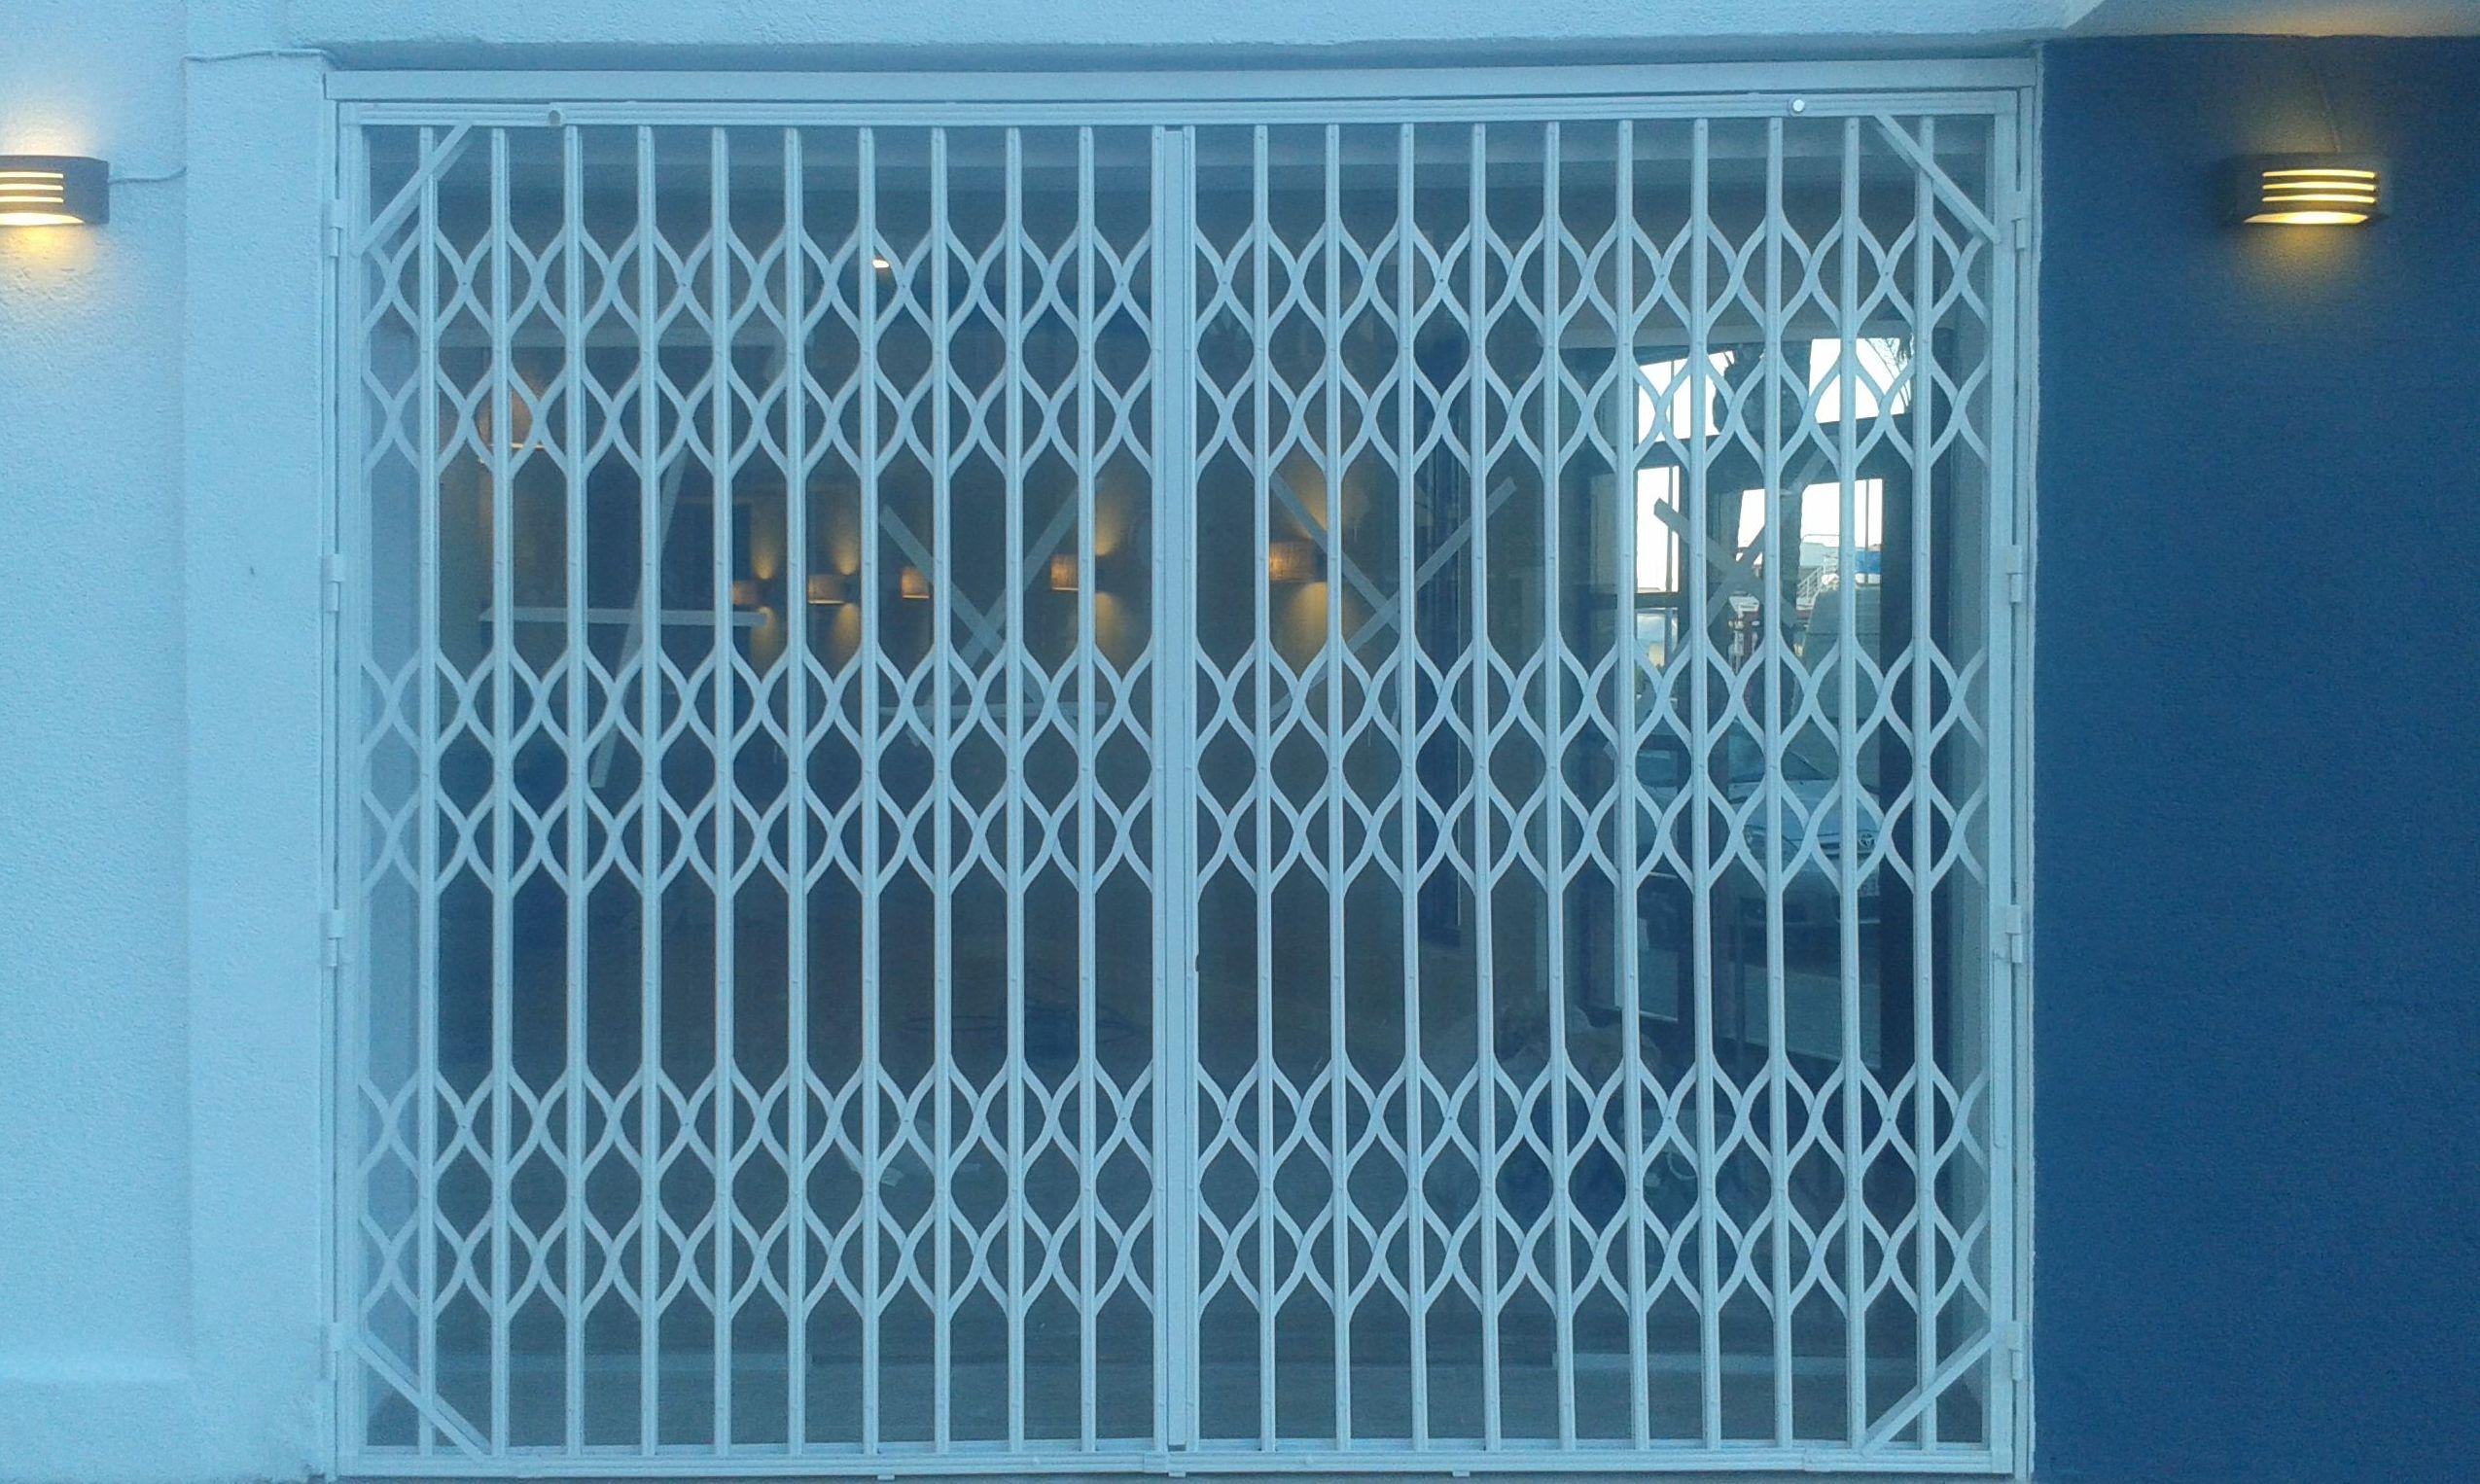 Puerta de ballesta en Rte gavila